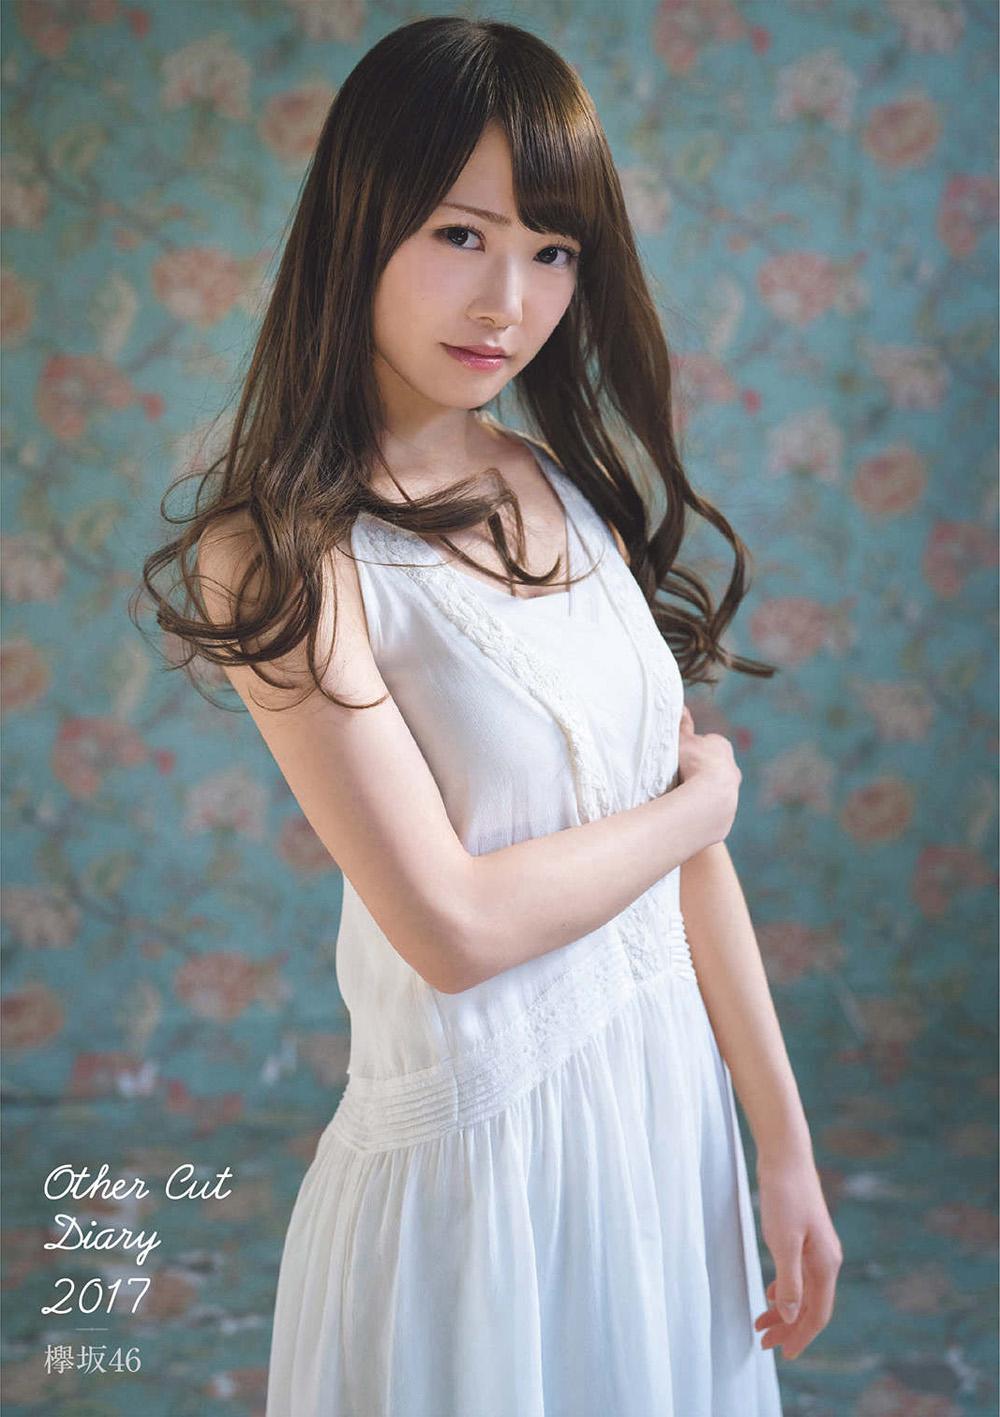 Keyakizaka46 欅坂46, FLASHスペシャルグラビアBEST 2018新春号